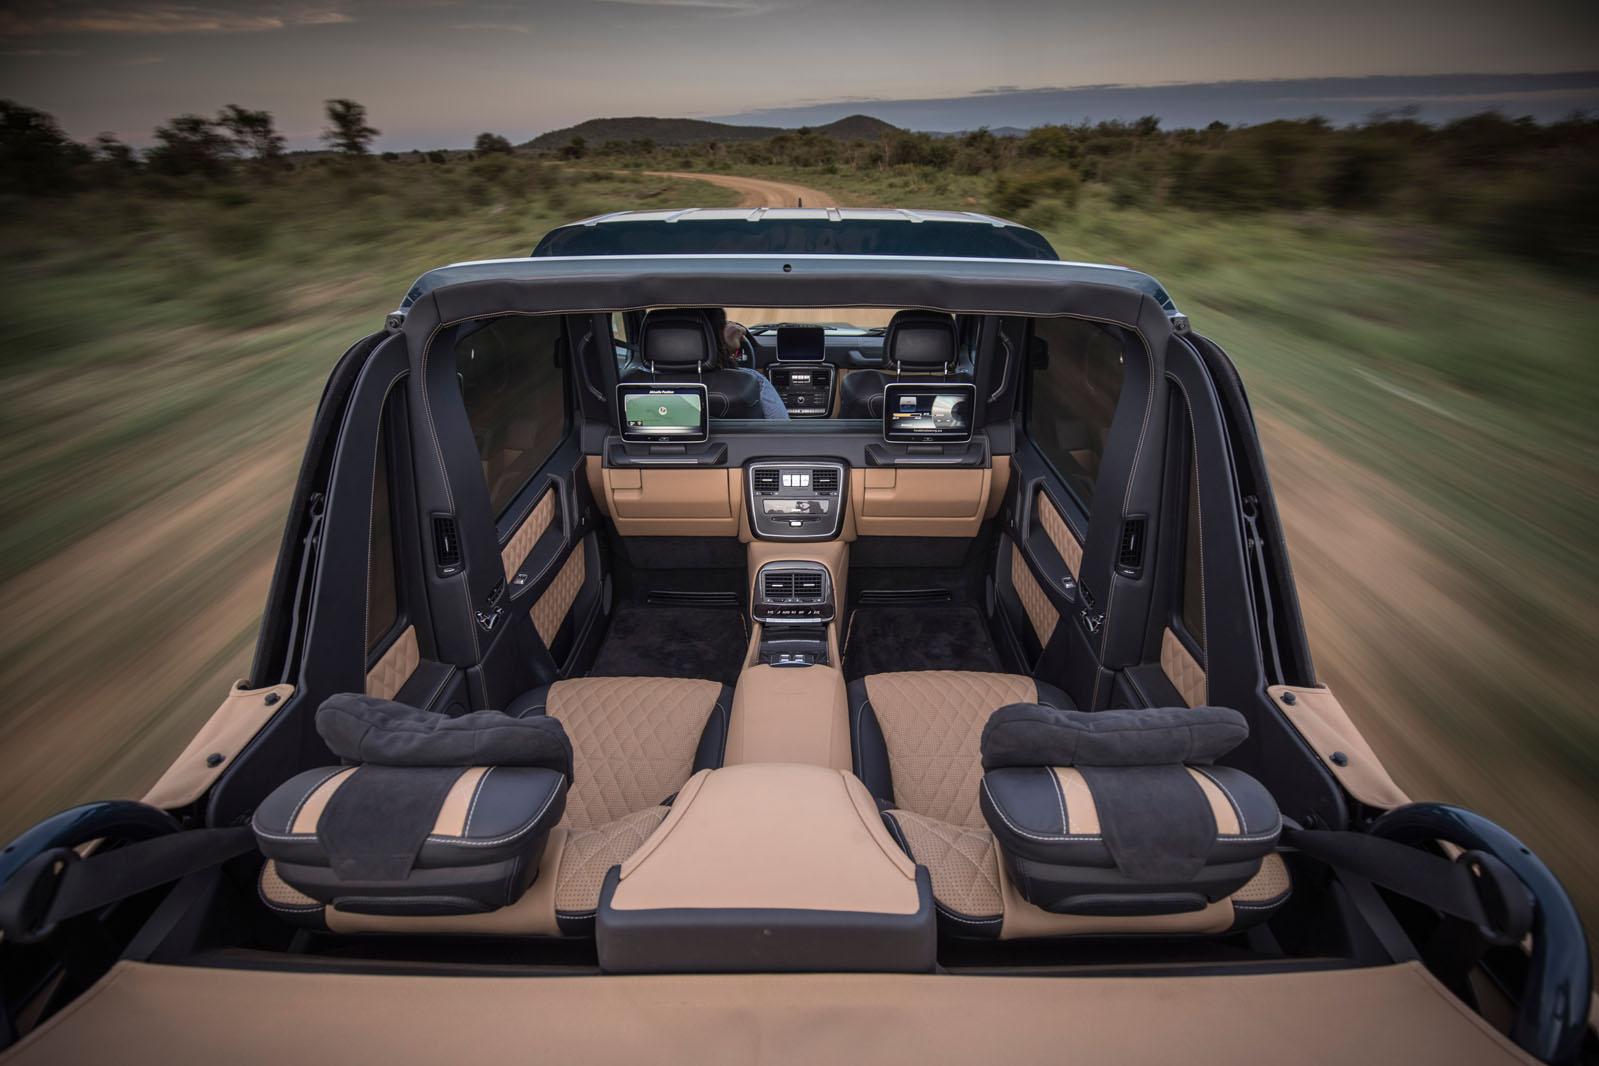 Mercedes Maybach G650 Landaulet We Take A Ride Through The African Wild Autocar